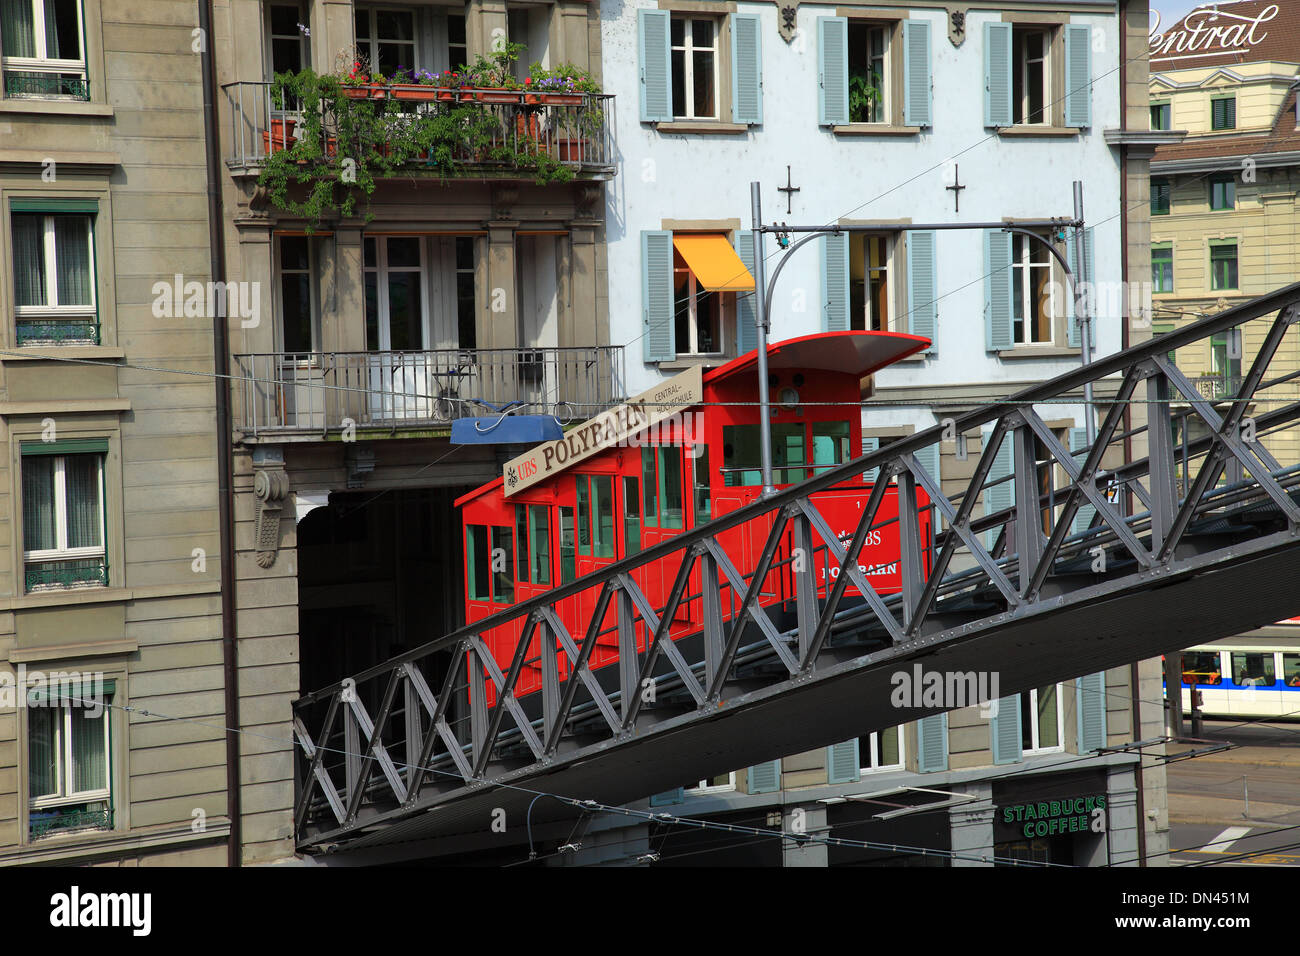 Switzerland, Zurich, polybahn to University. Stock Photo